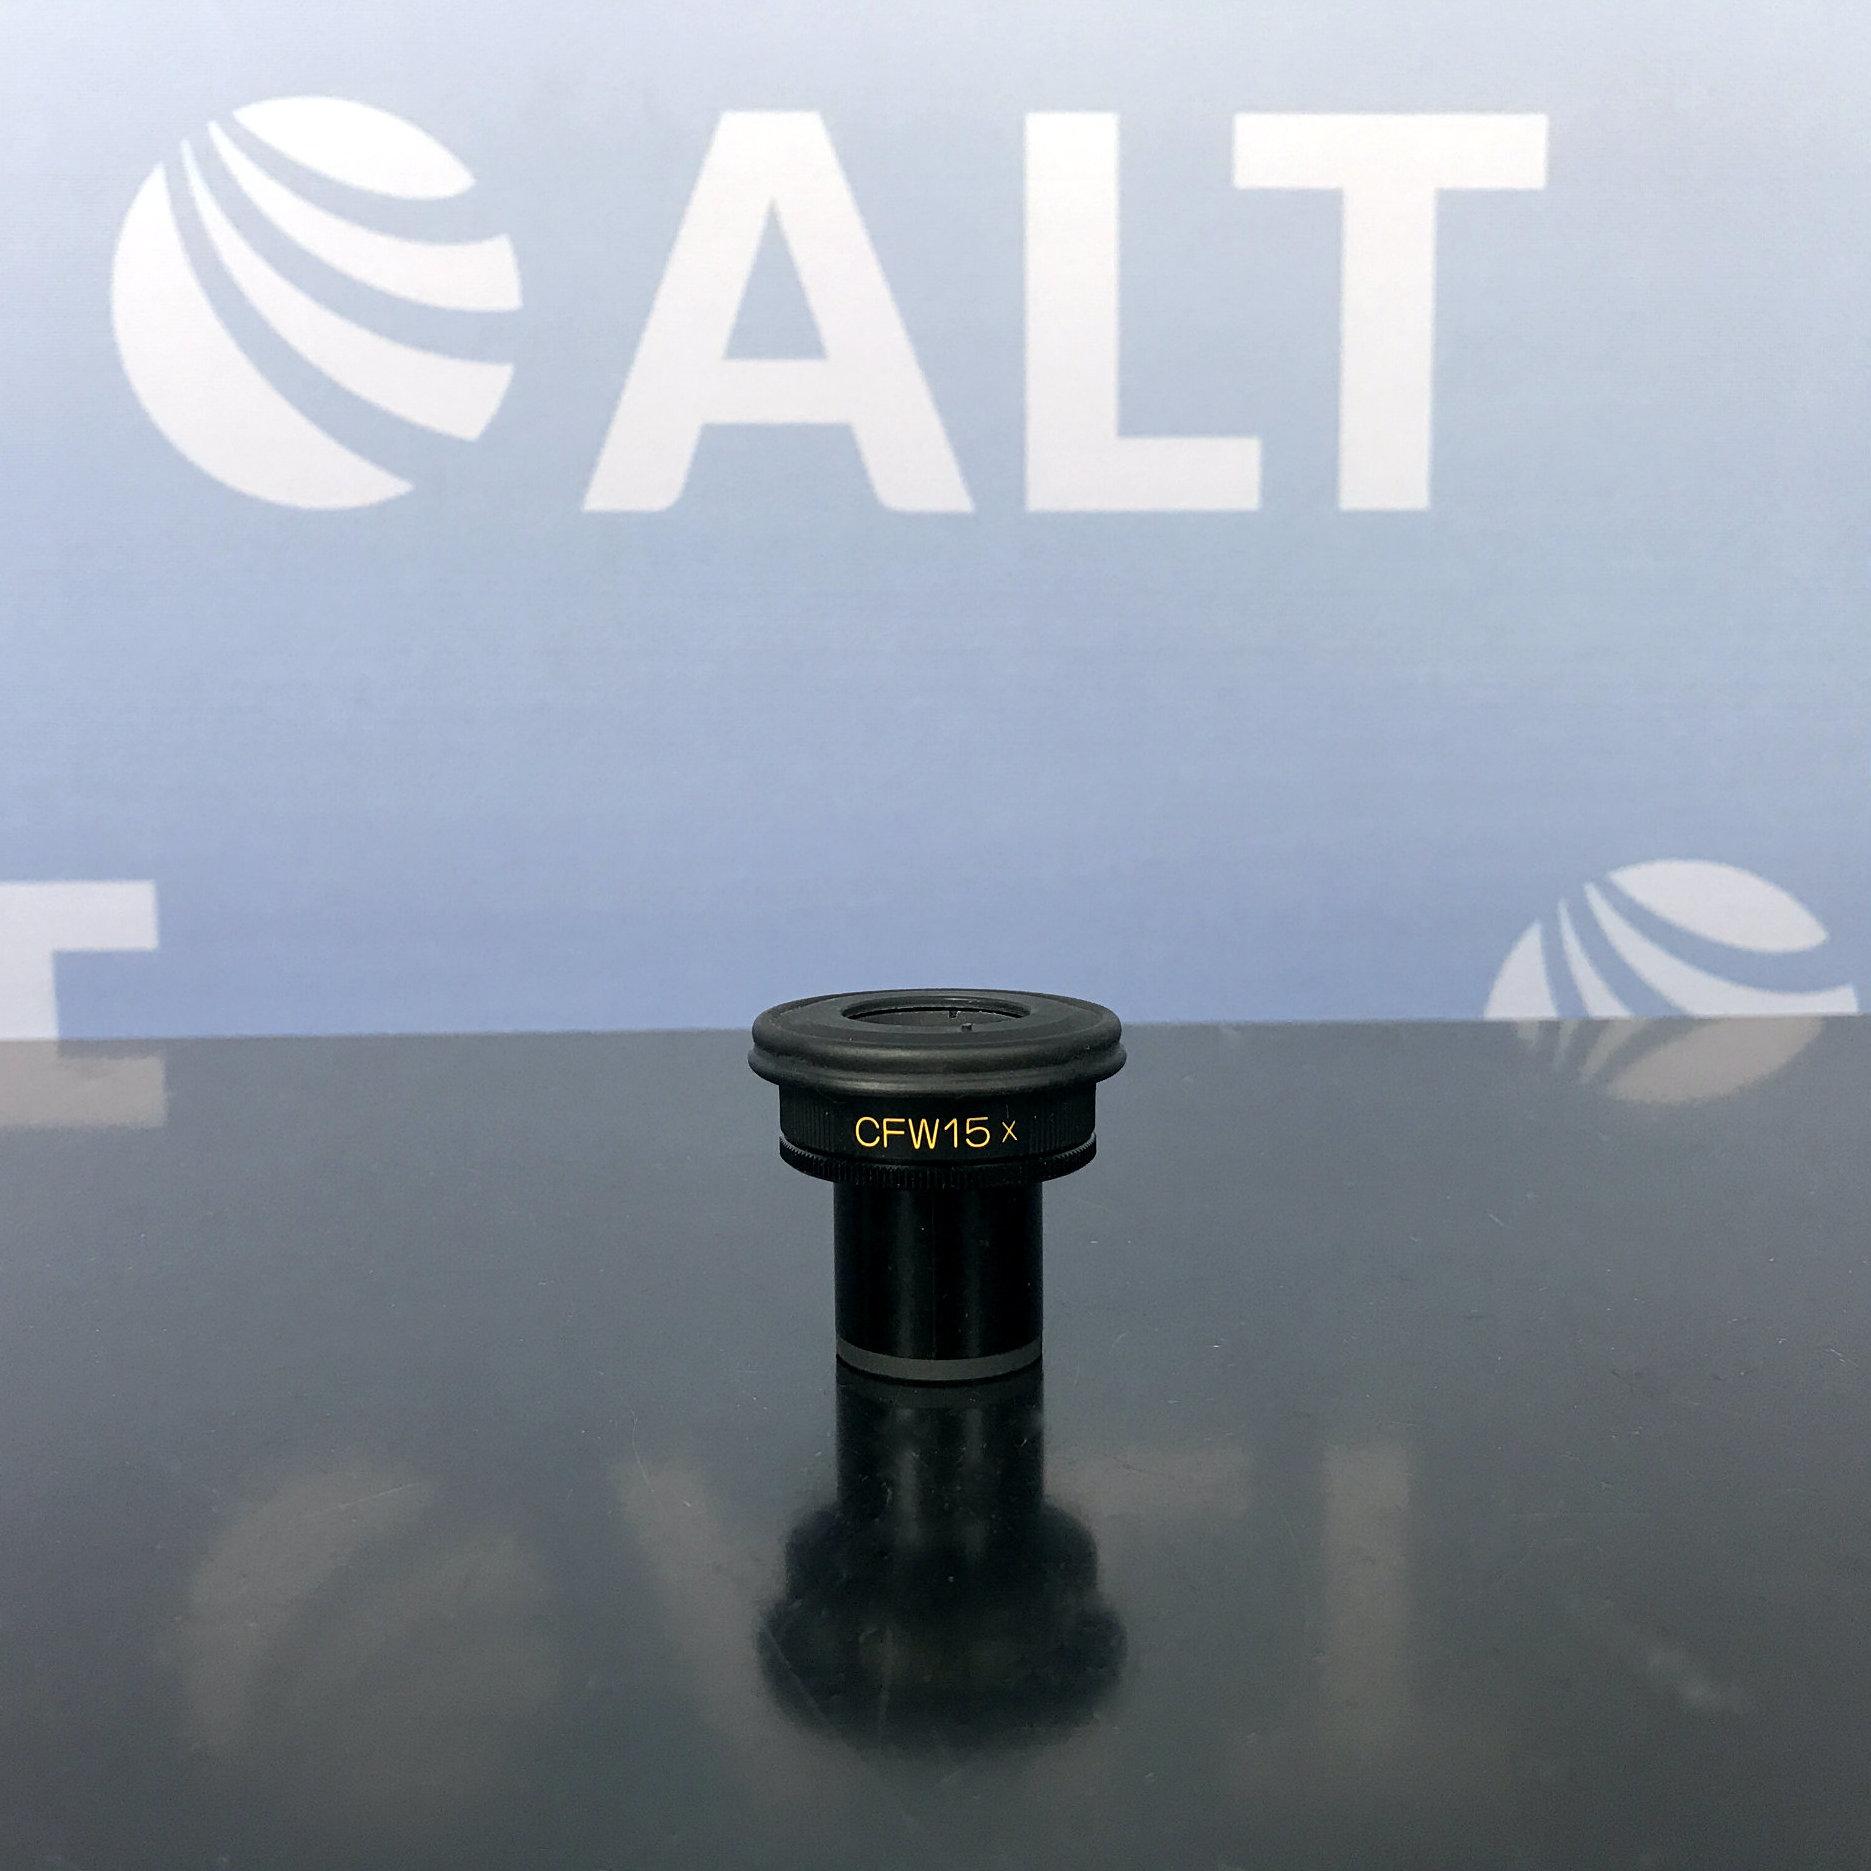 Nikon MBJ10150 Microscope Eyepiece ME X CFW 15x Image